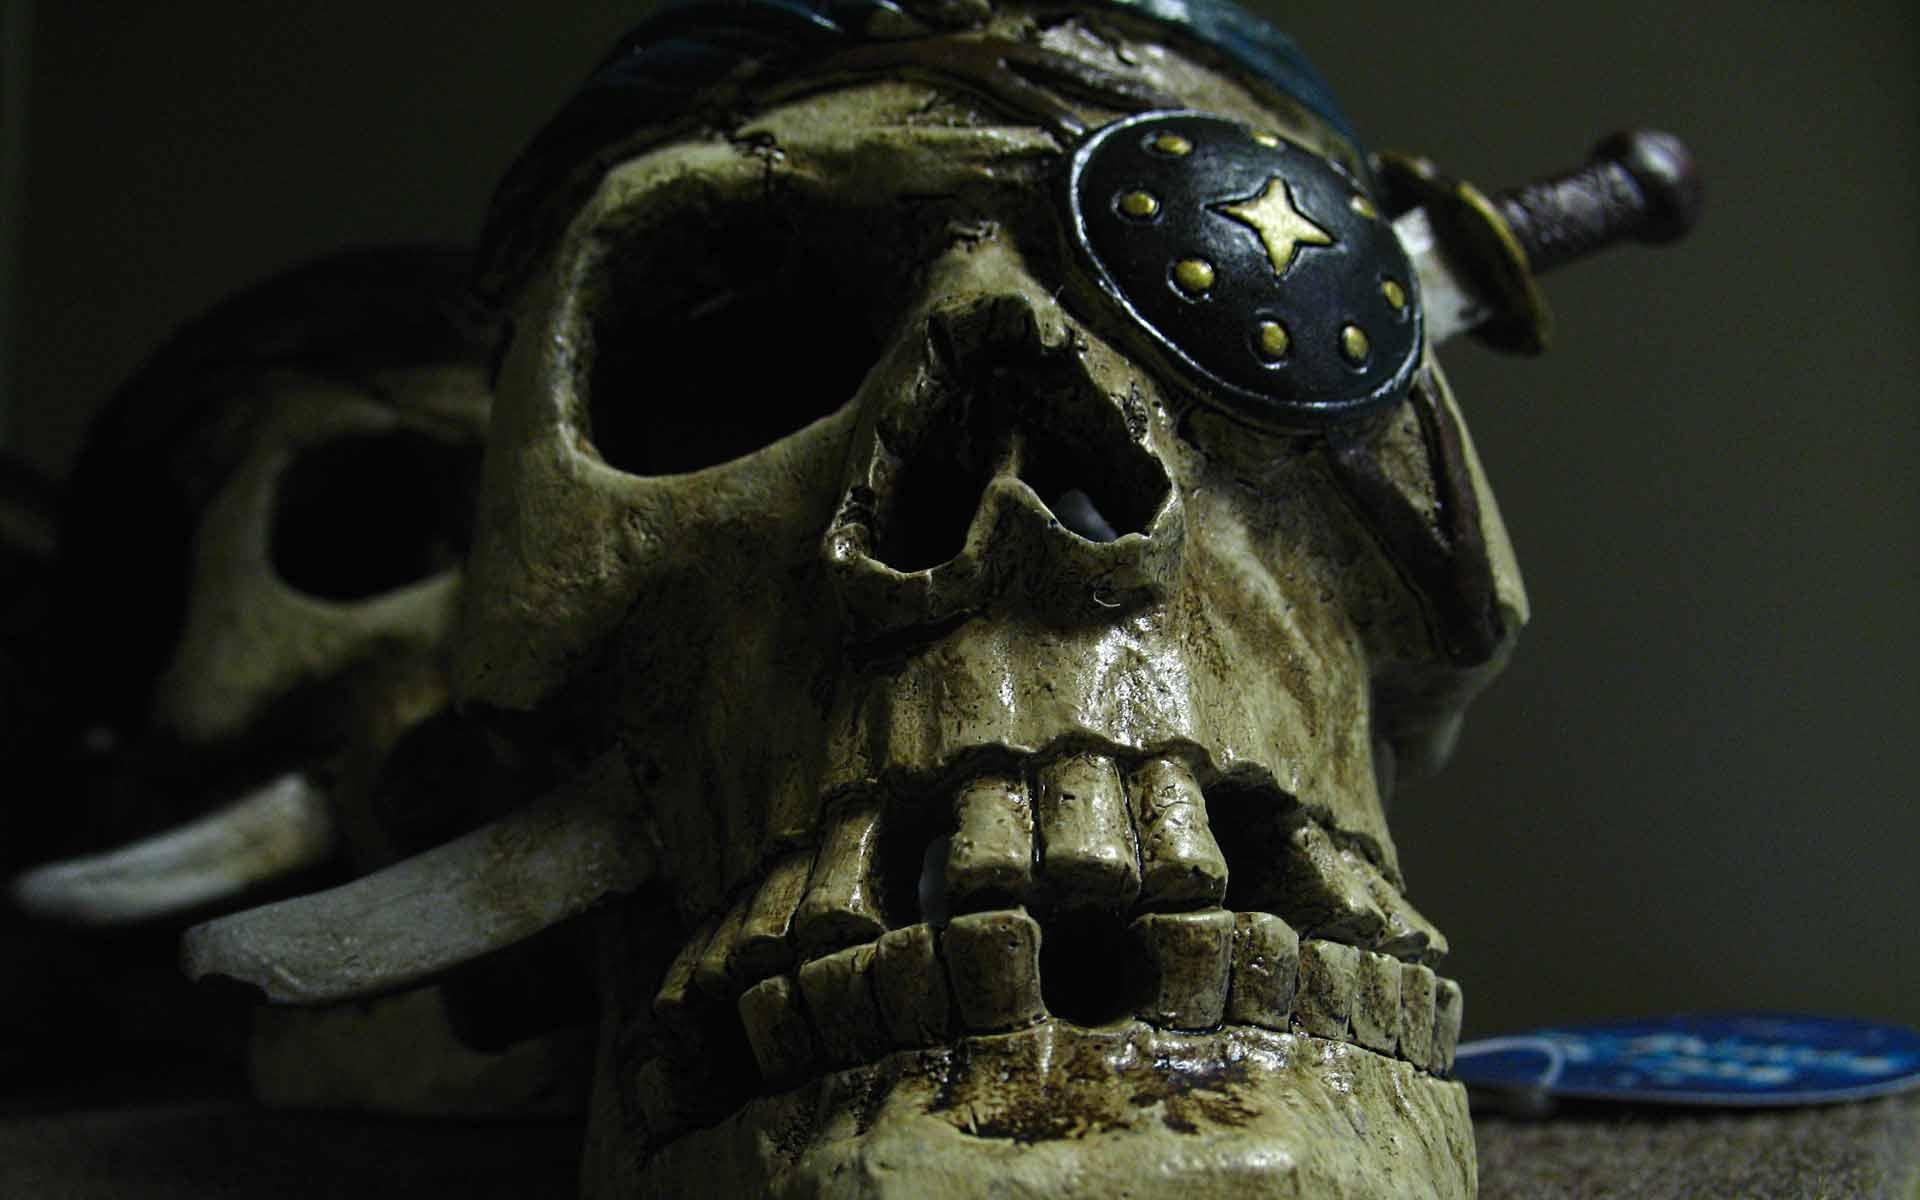 Pirate Skull Fondo De Pantalla Hd Fondo De Escritorio